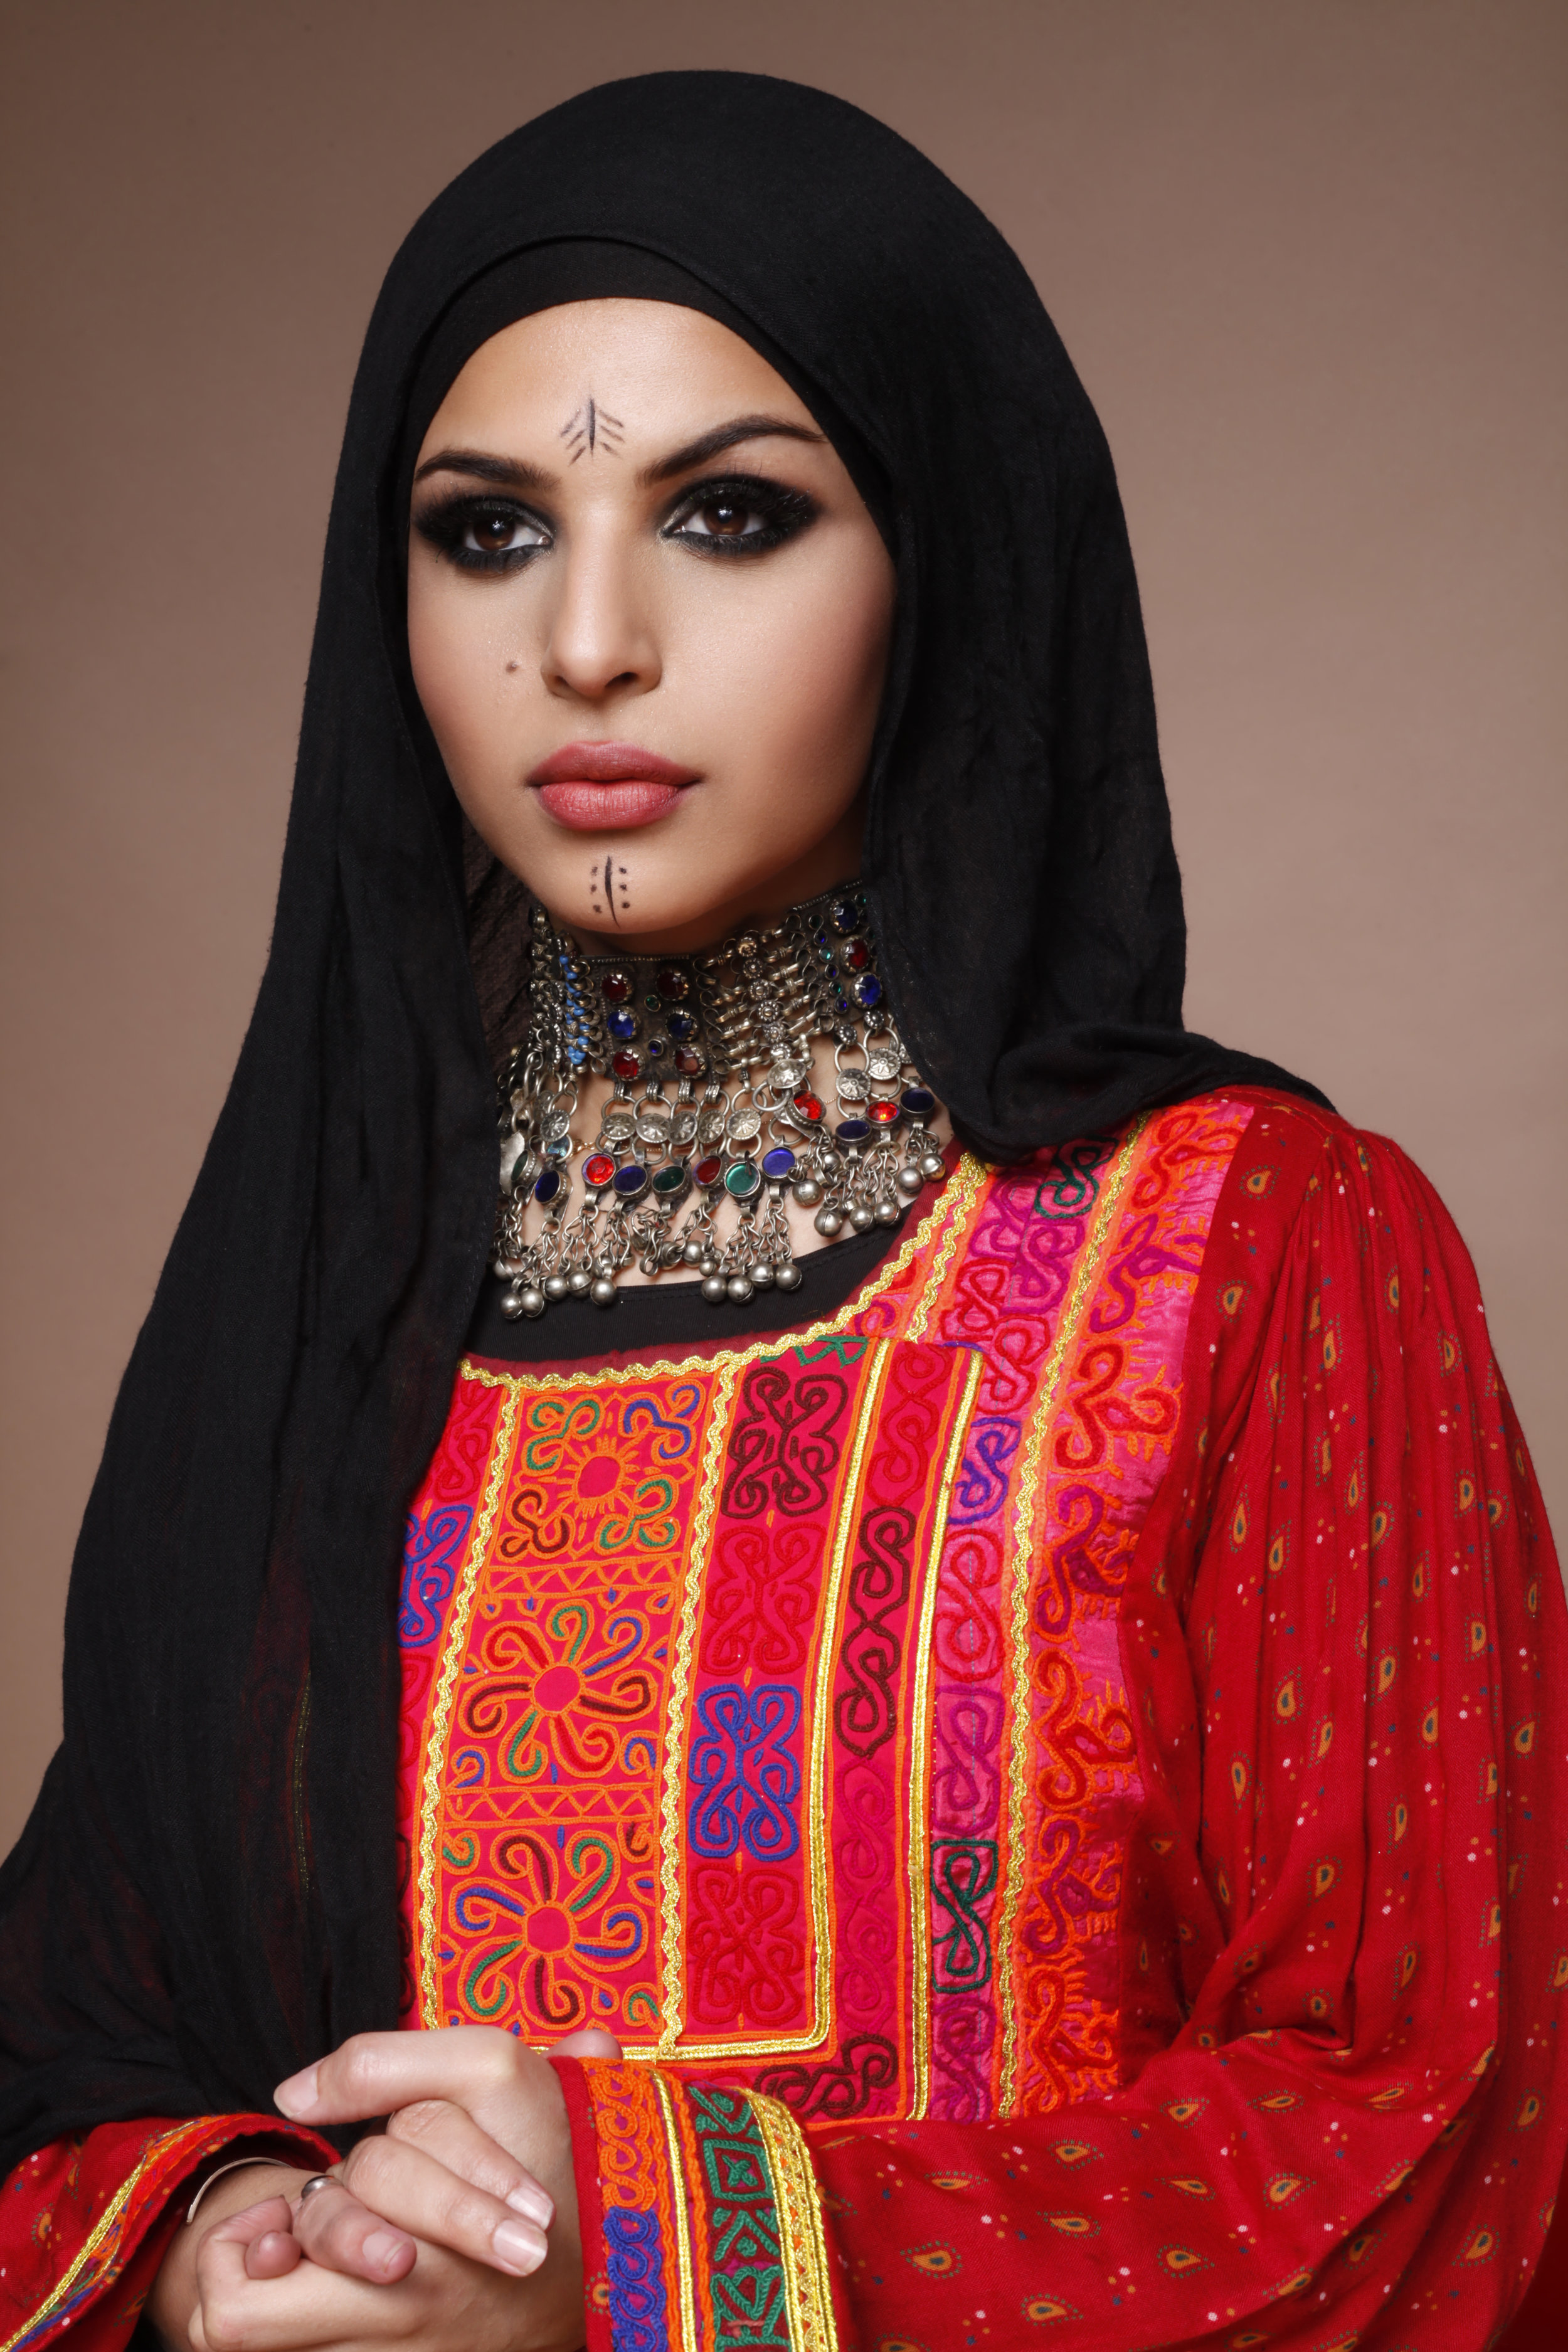 shiemanasif x mocha girl beauty